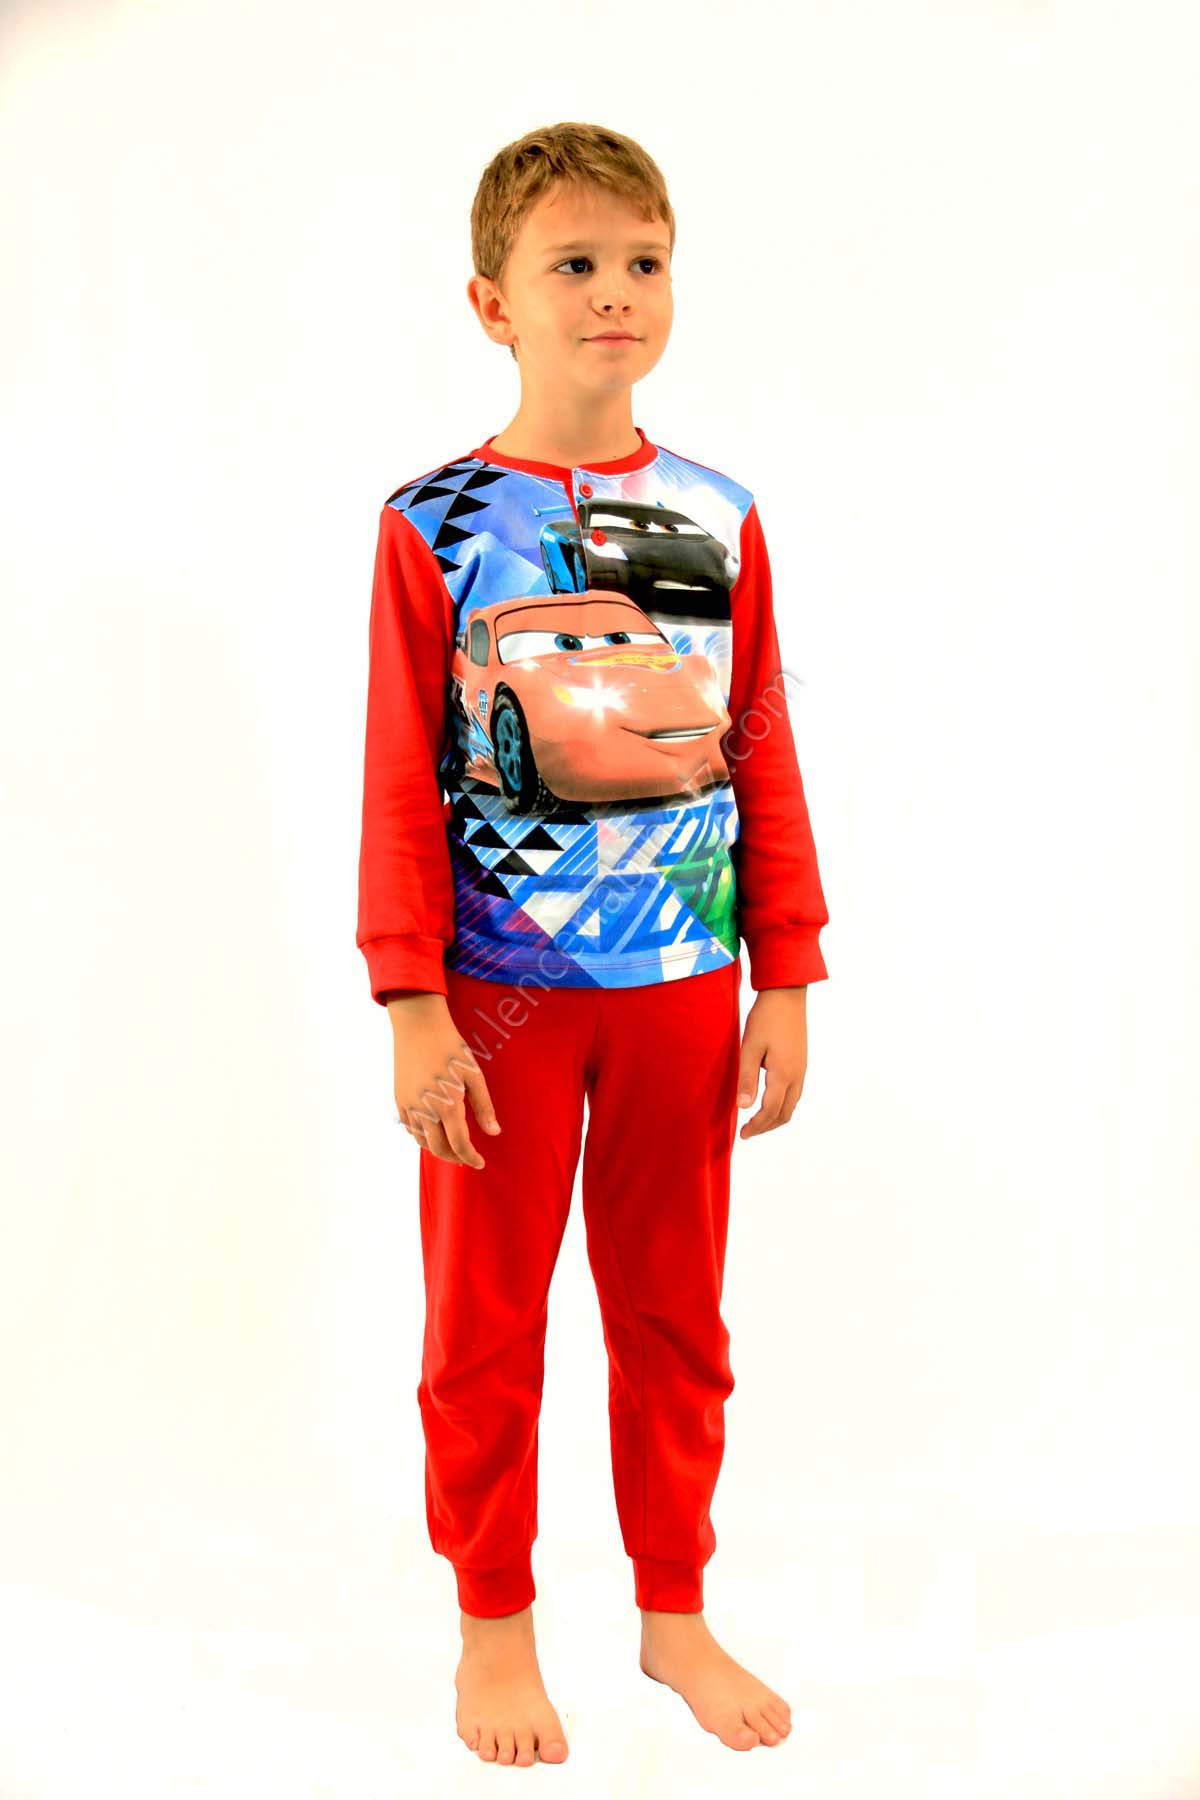 Pijama Nino Algodon Cars Punos En Mangas Y Pantalon